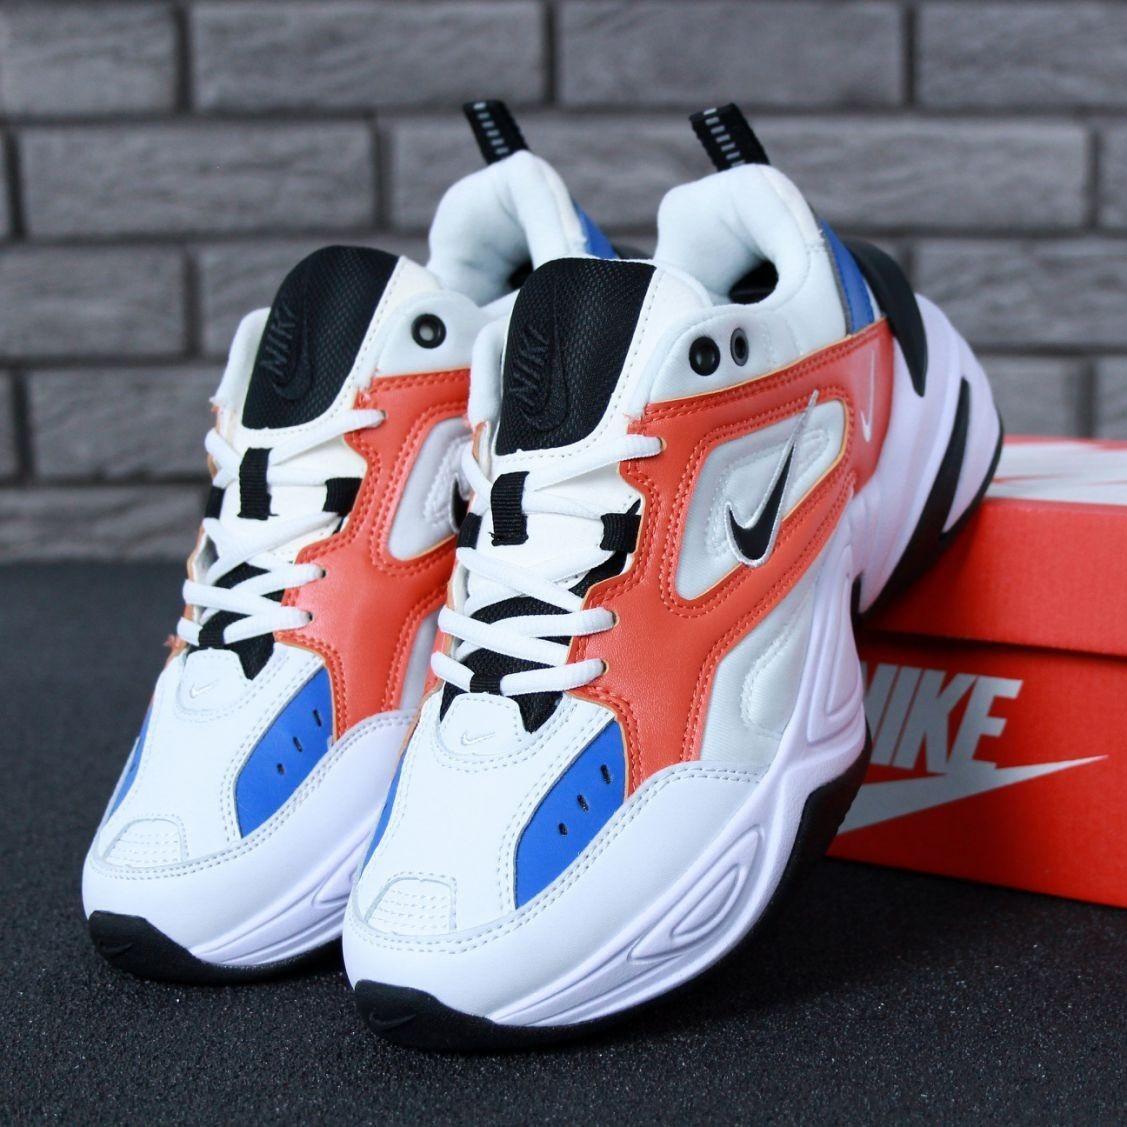 Женские кроссовки в стиле Nike M2k Tekno